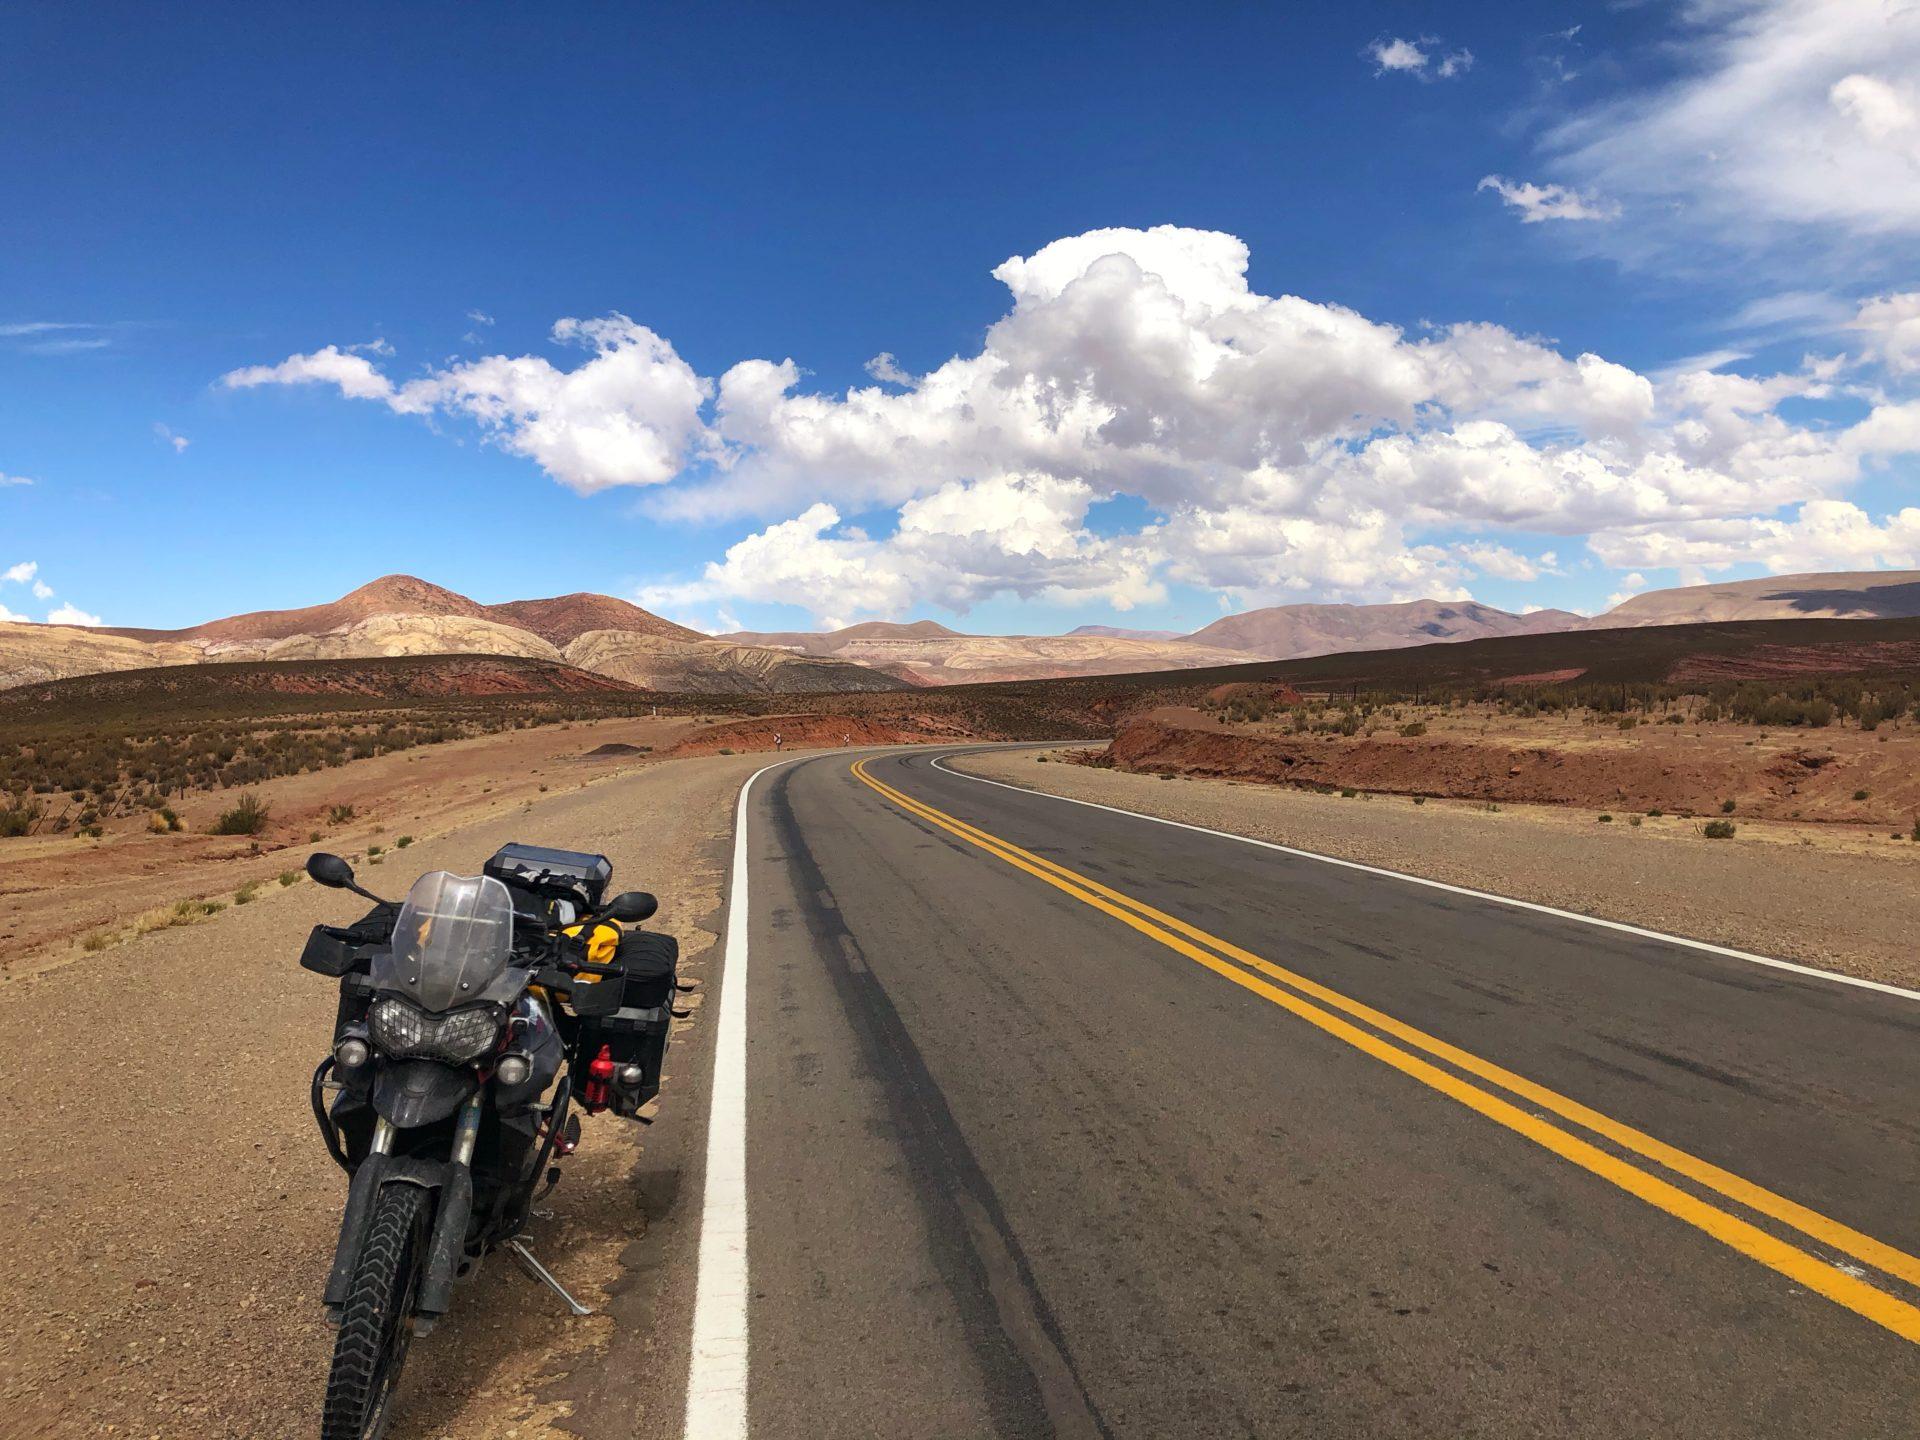 Auf dem Weg nach La Quiaca